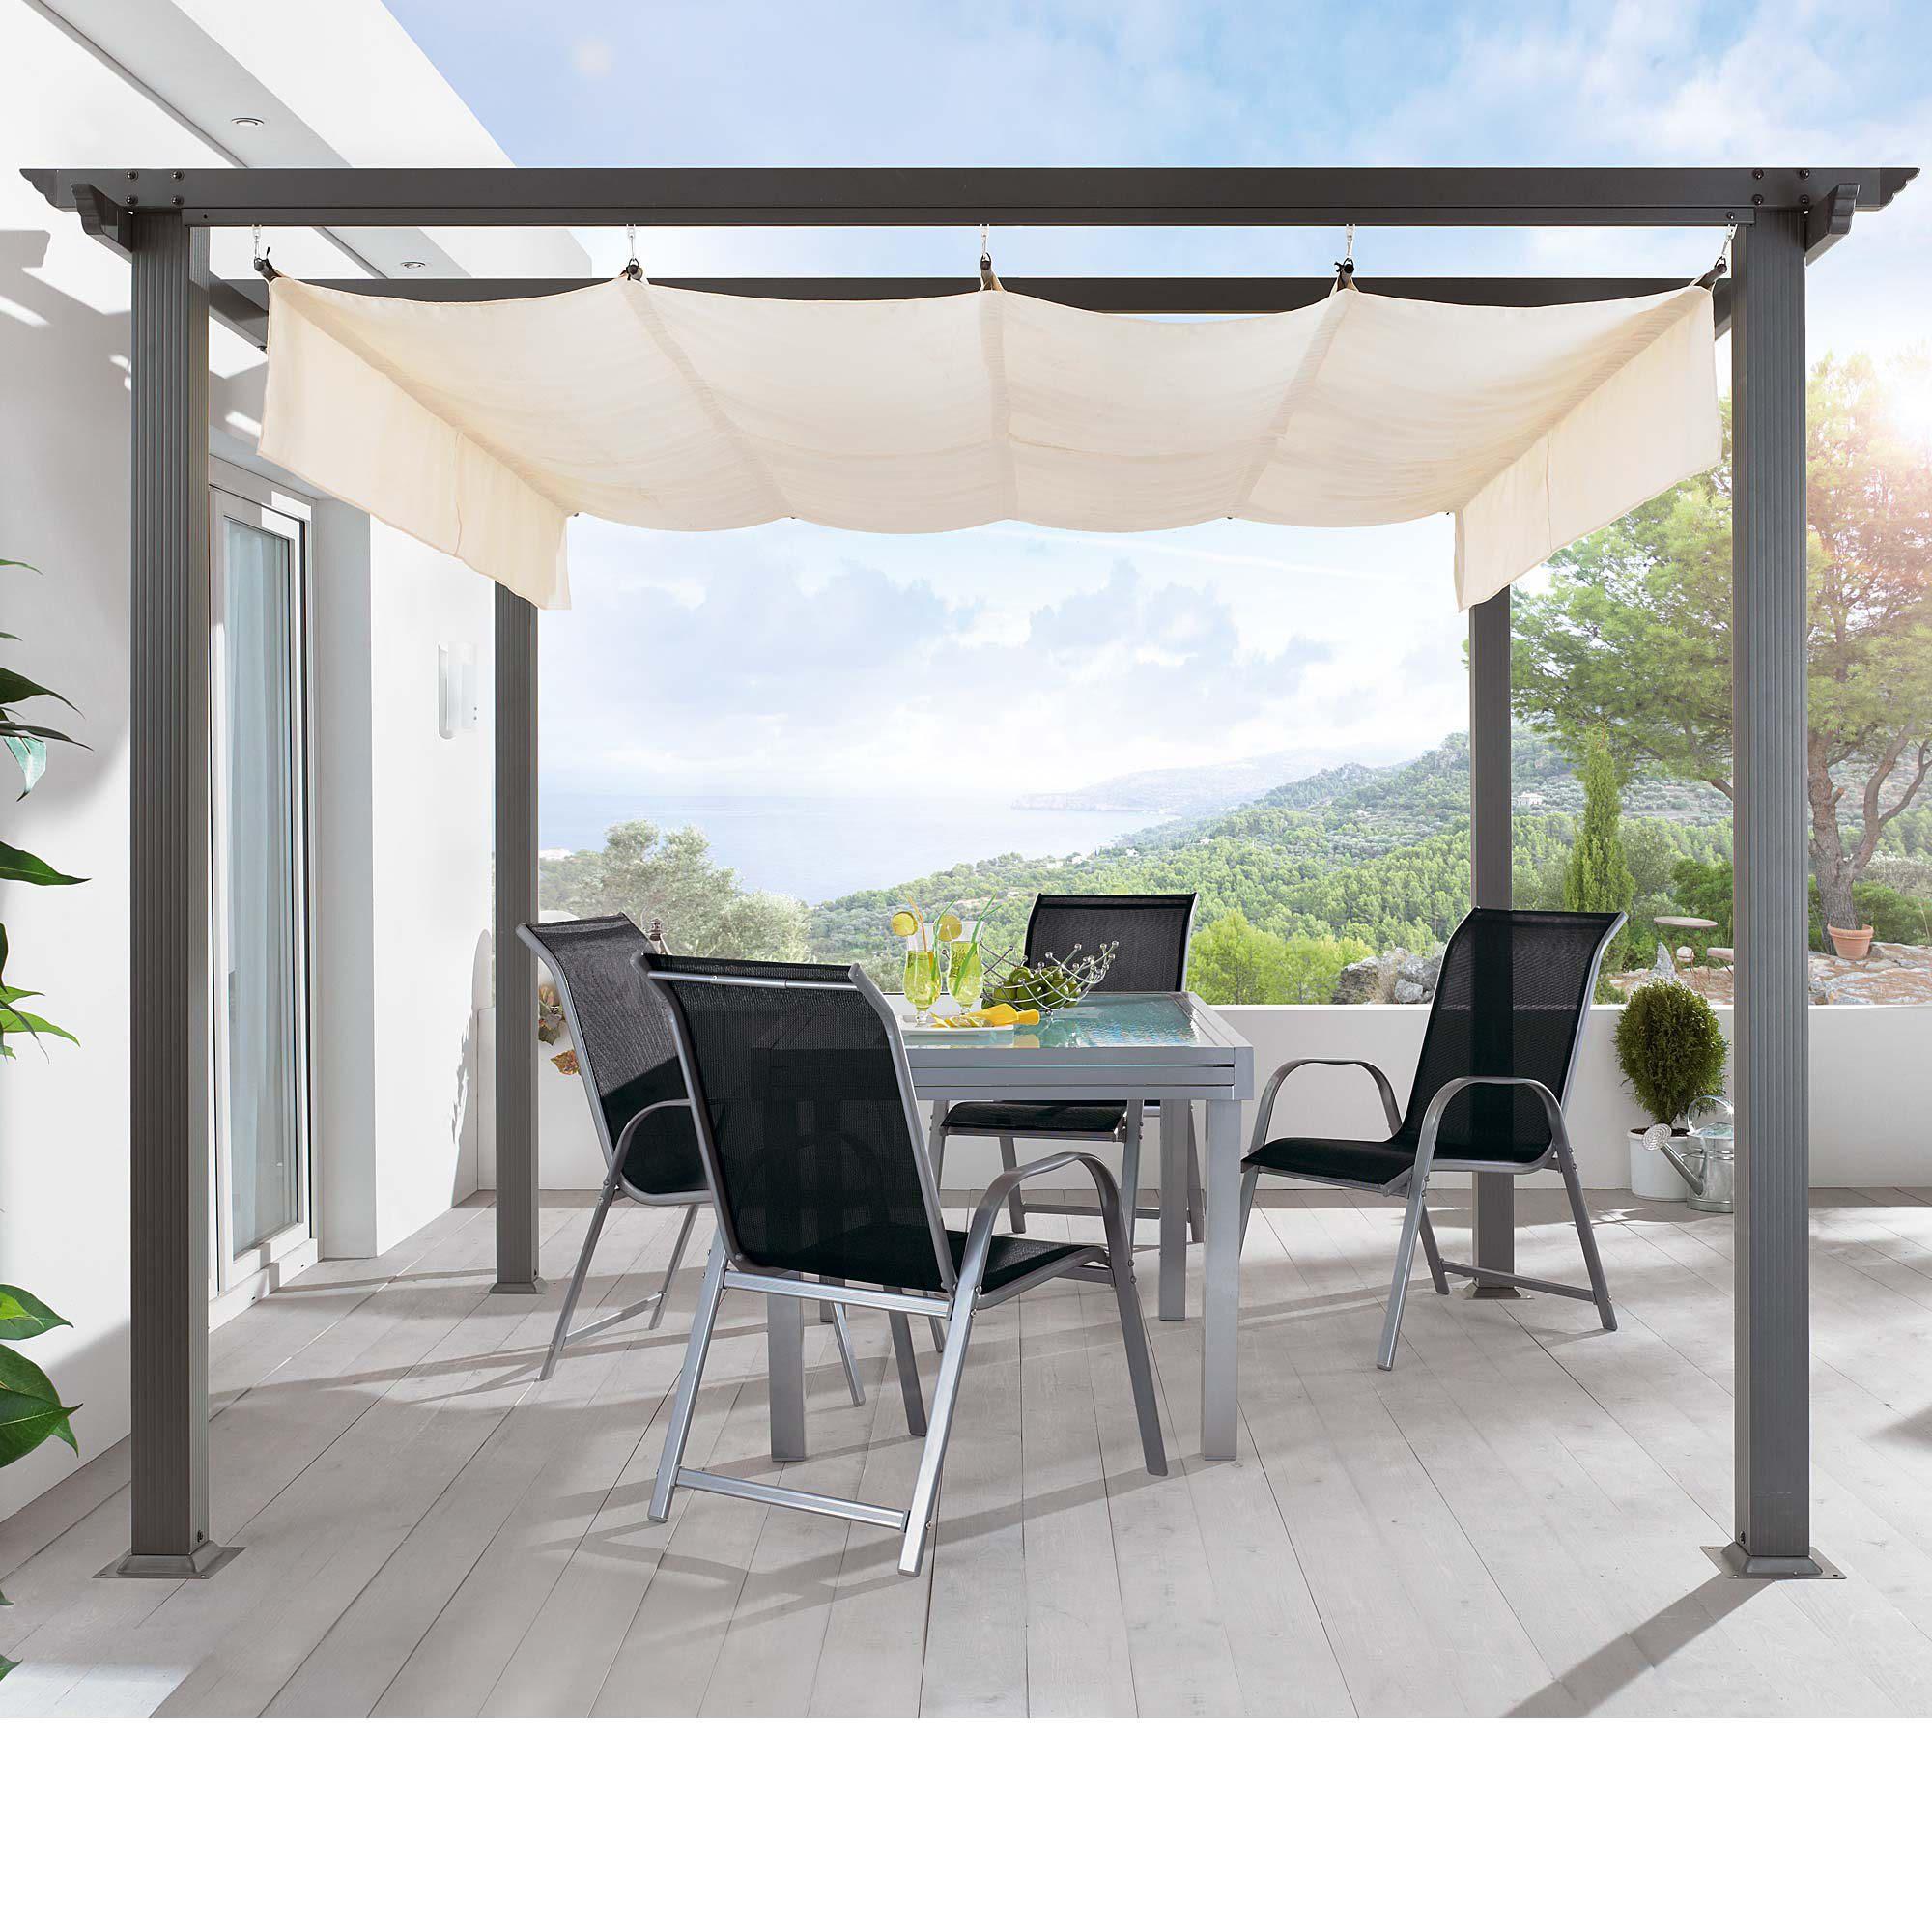 Design-pergola, Pulverbeschichtetes Aluminium, Dach: 100% Polyester Gartenpavillon Aus Aluminium